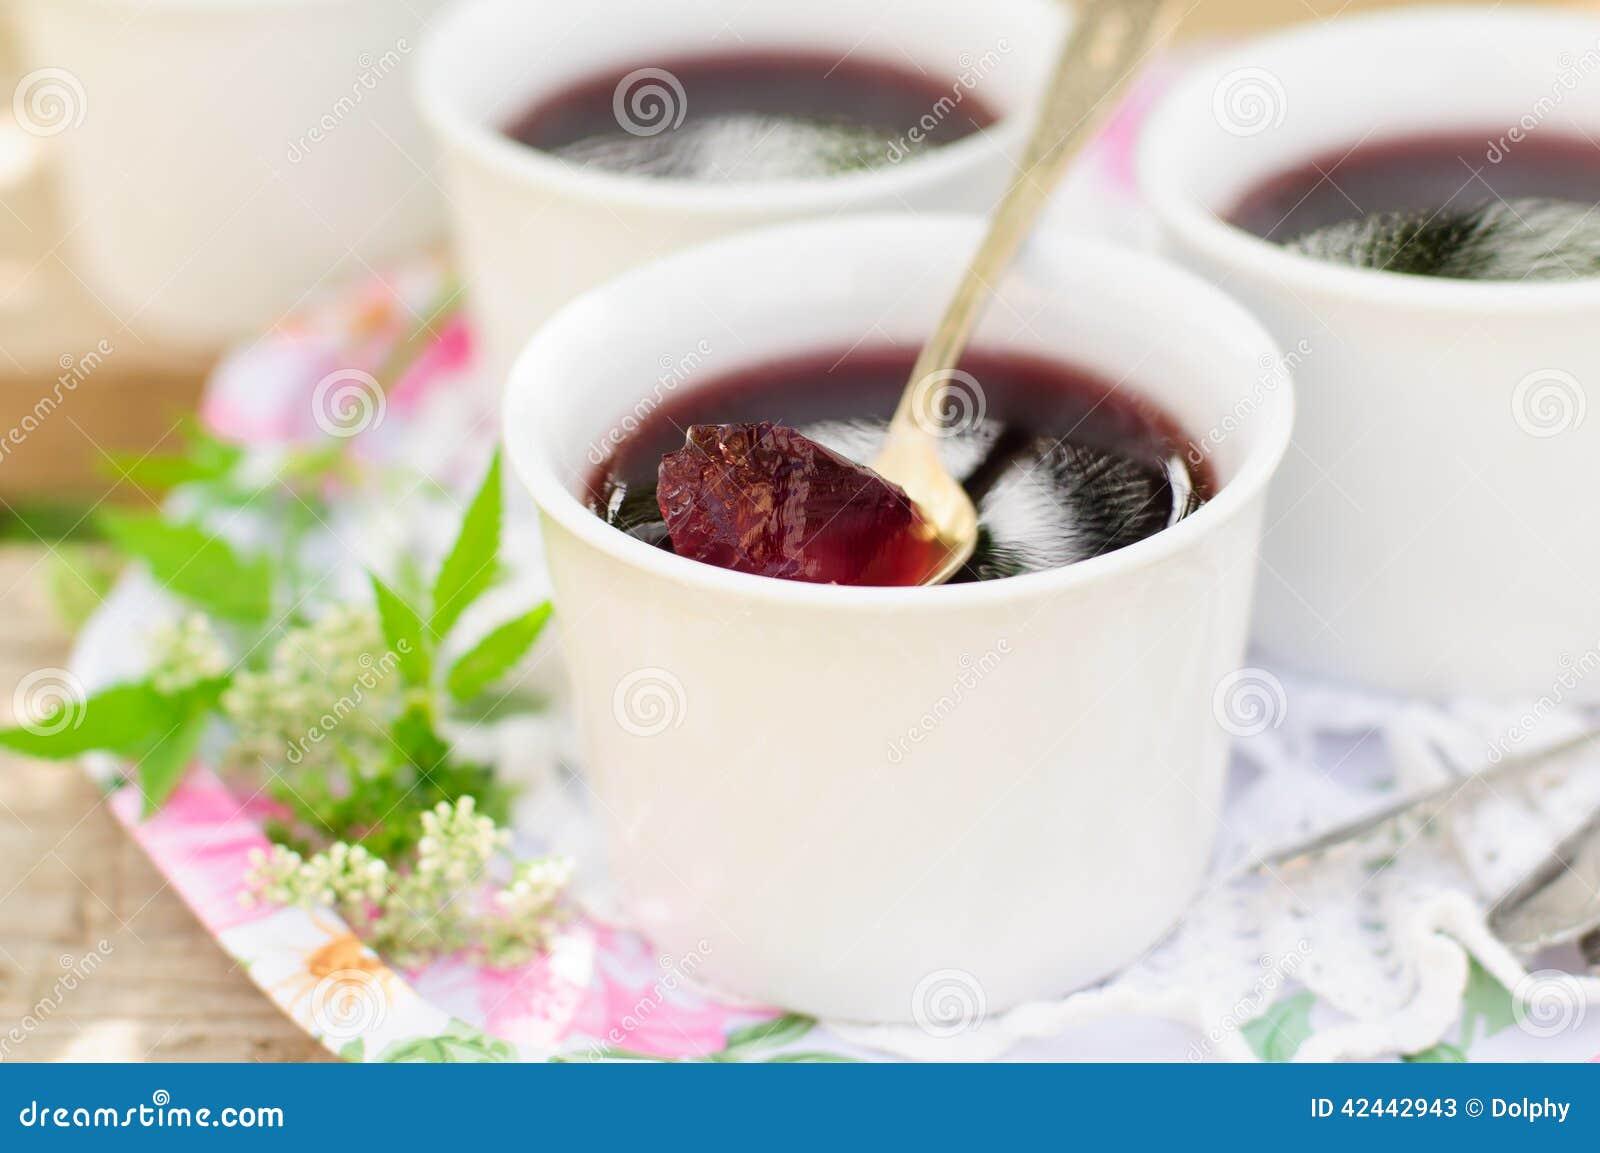 Berry Jelly